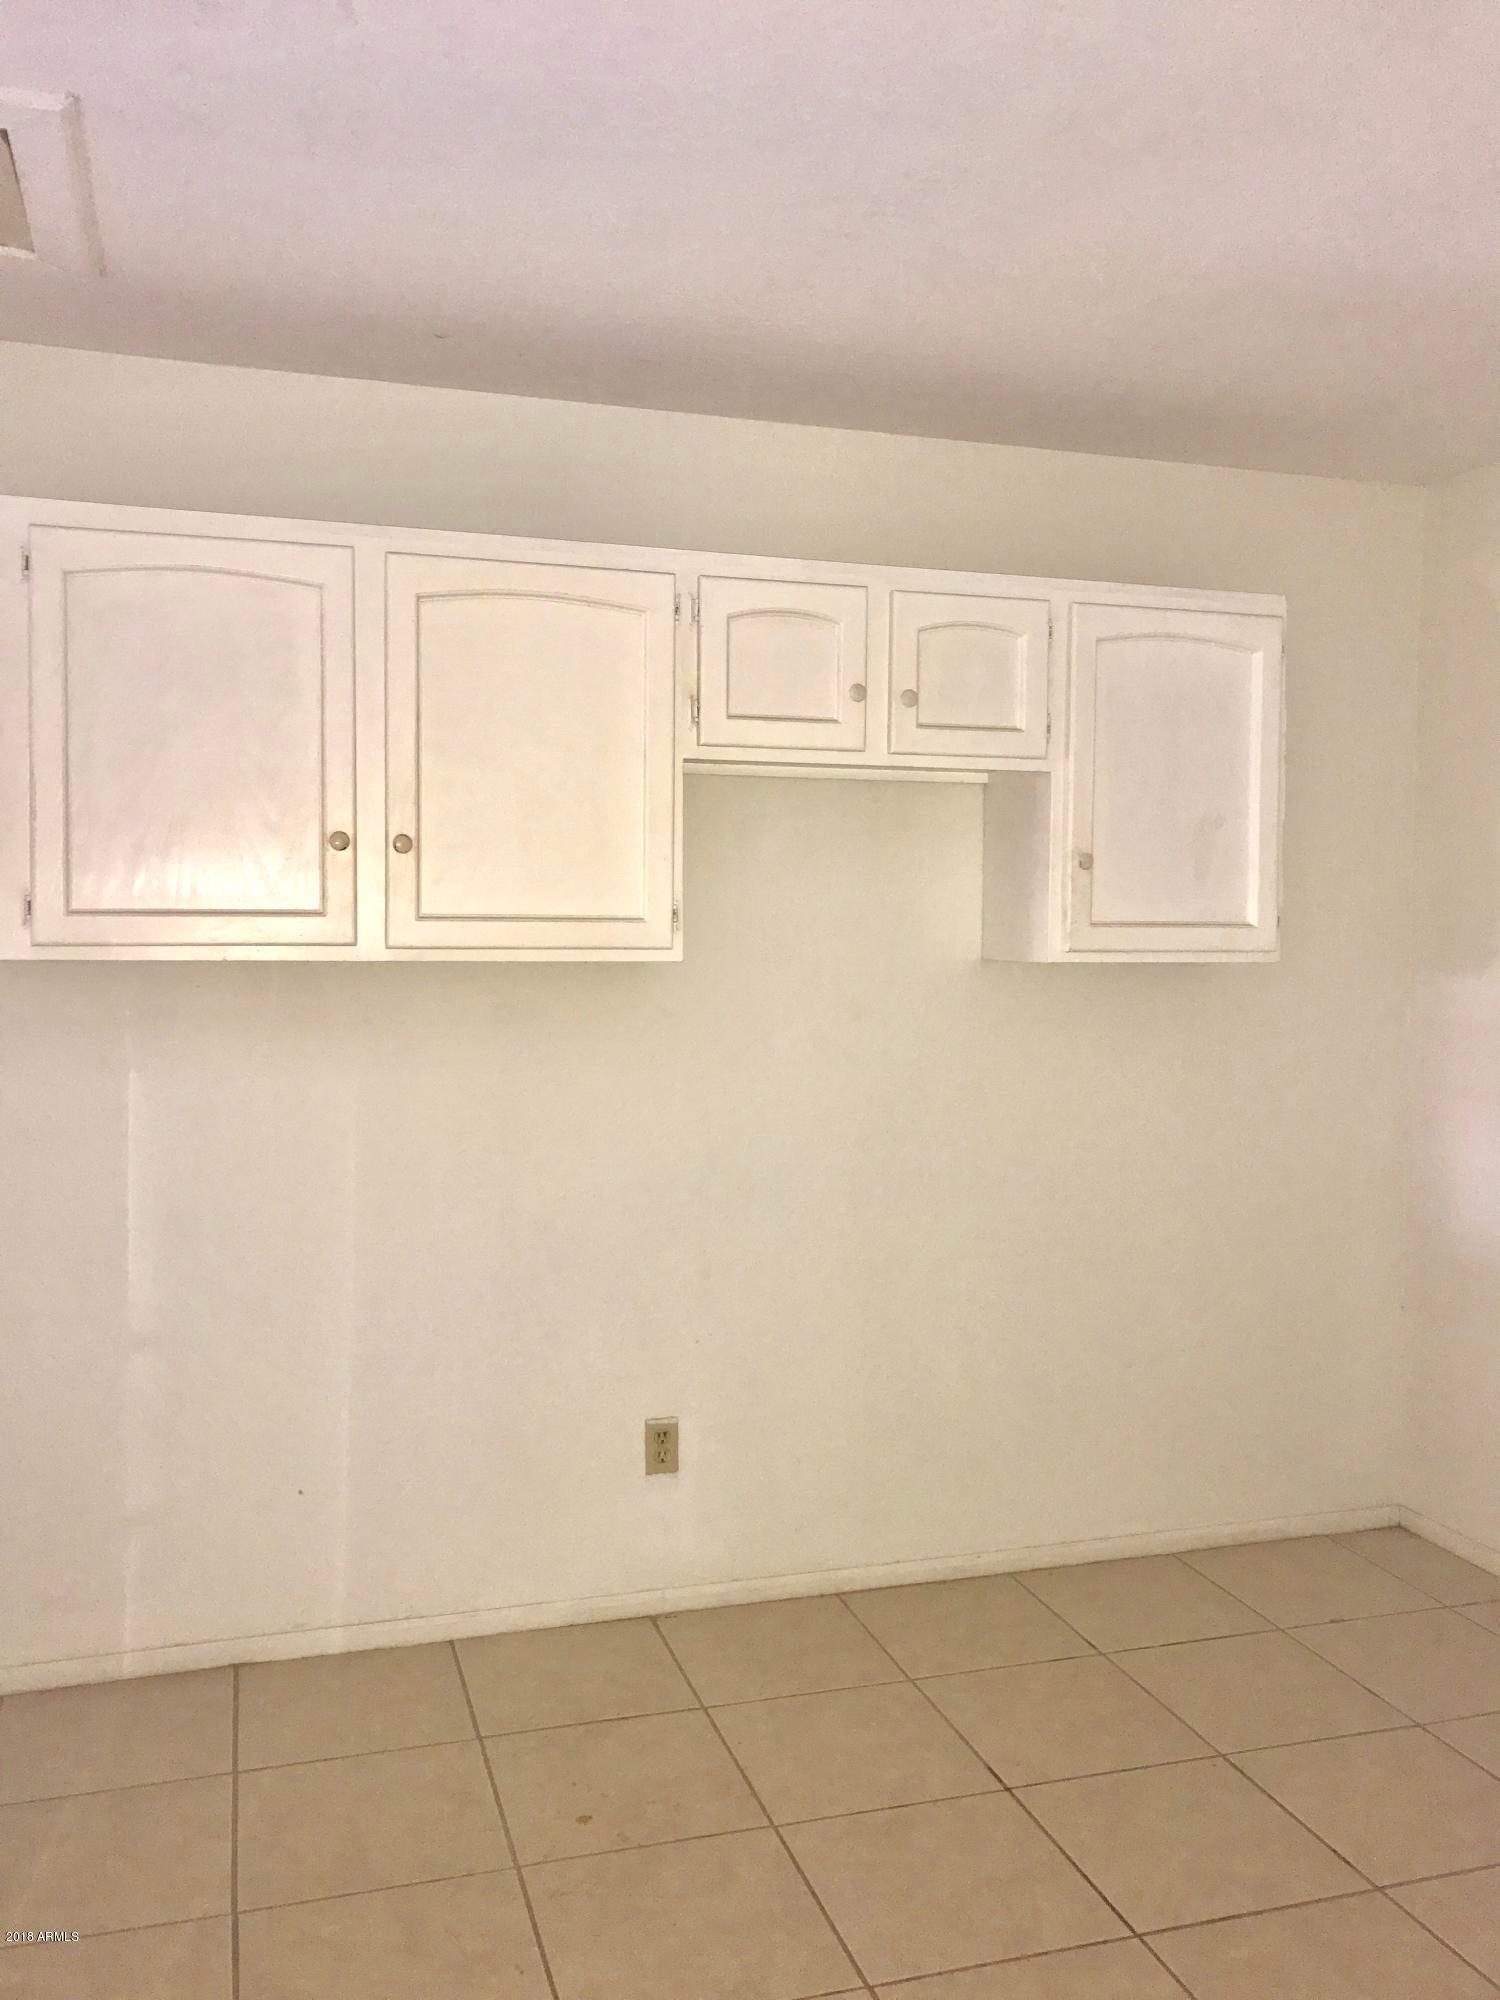 MLS 5796520 11334 W Winslow Avenue, Tolleson, AZ 85353 Tolleson AZ Luxury